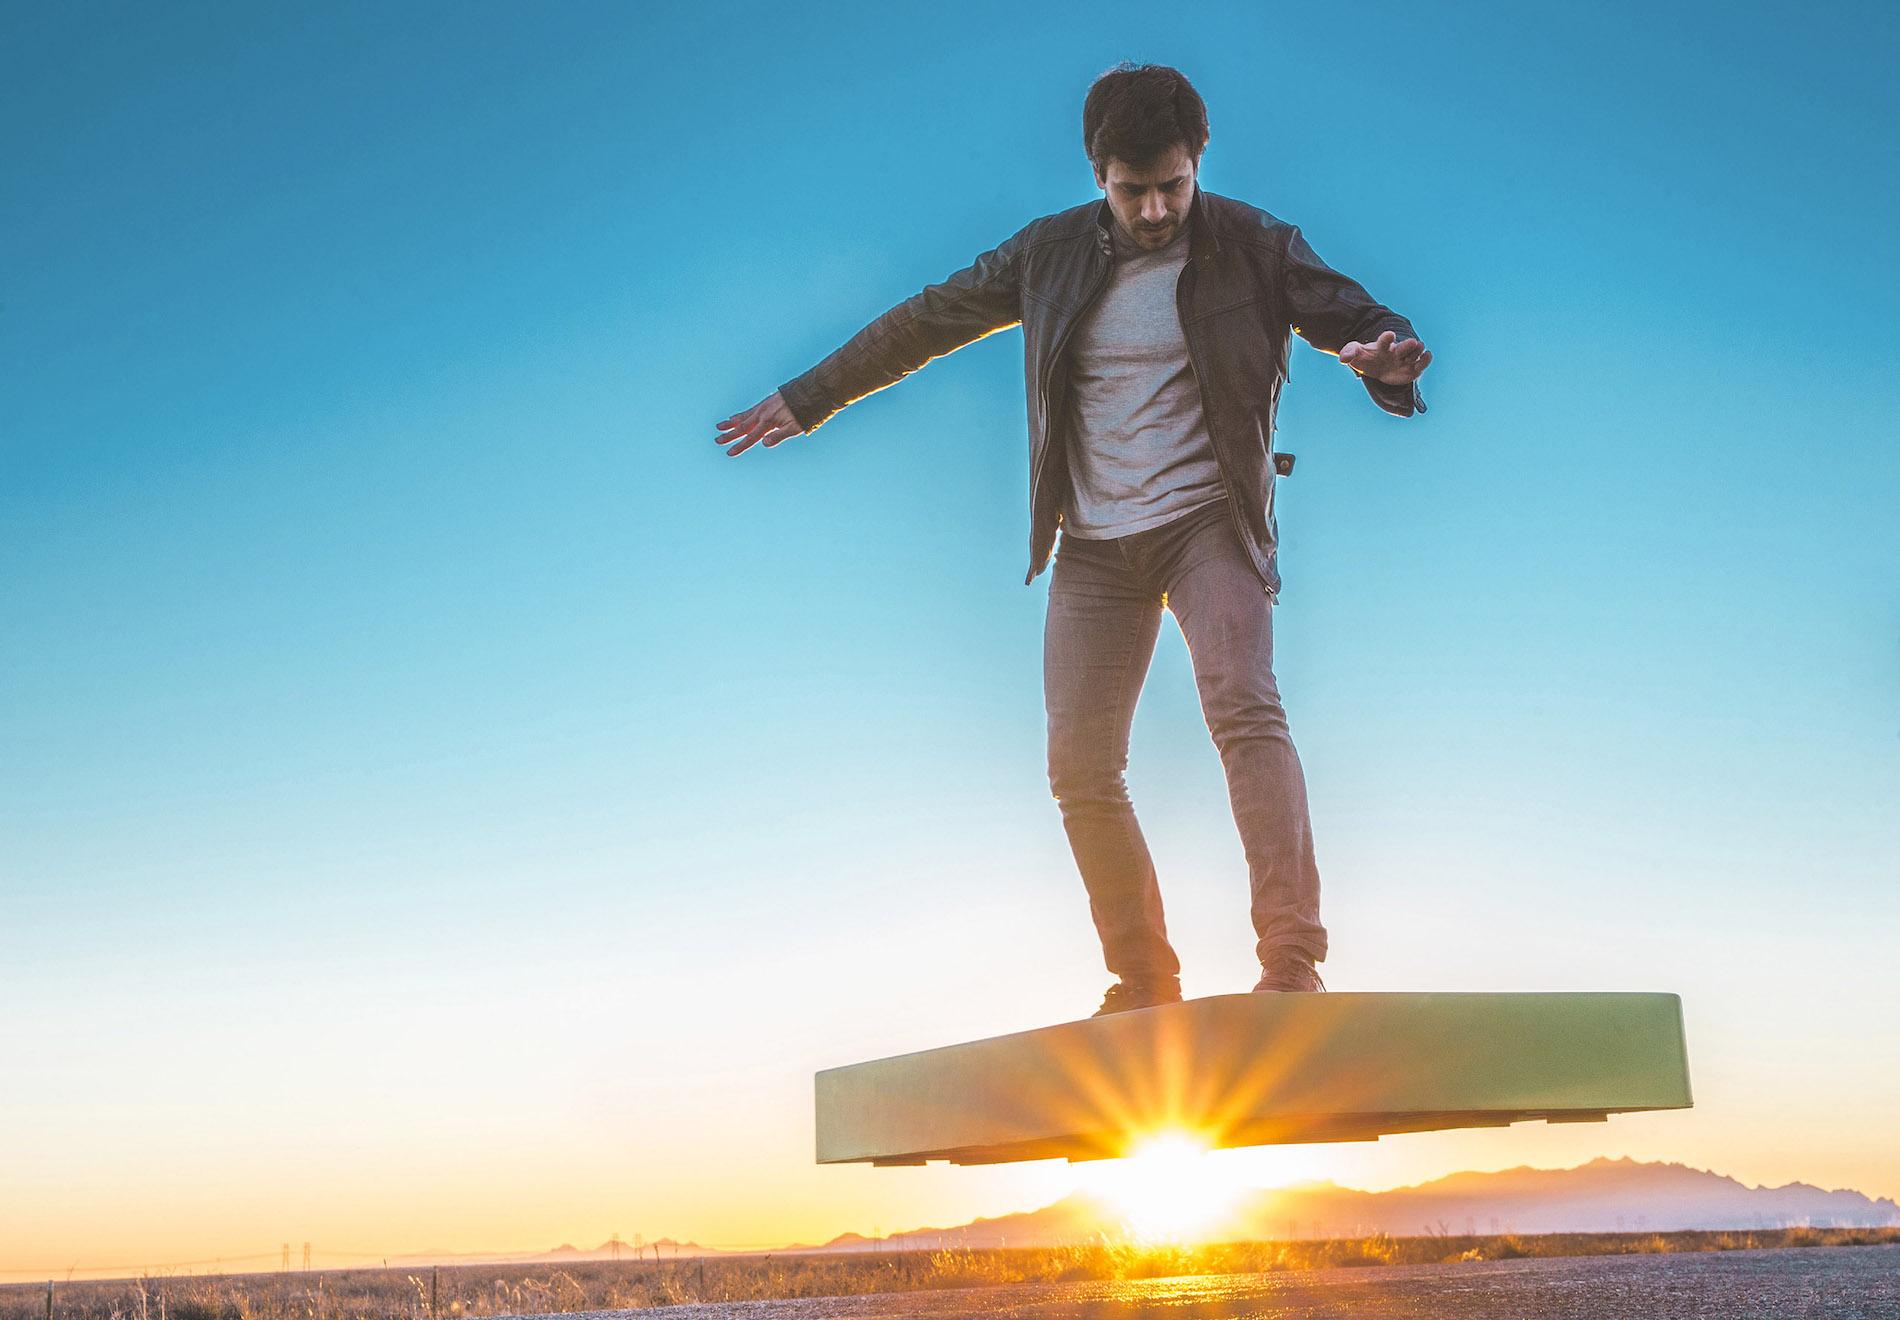 ArcaBoard Hoverboard